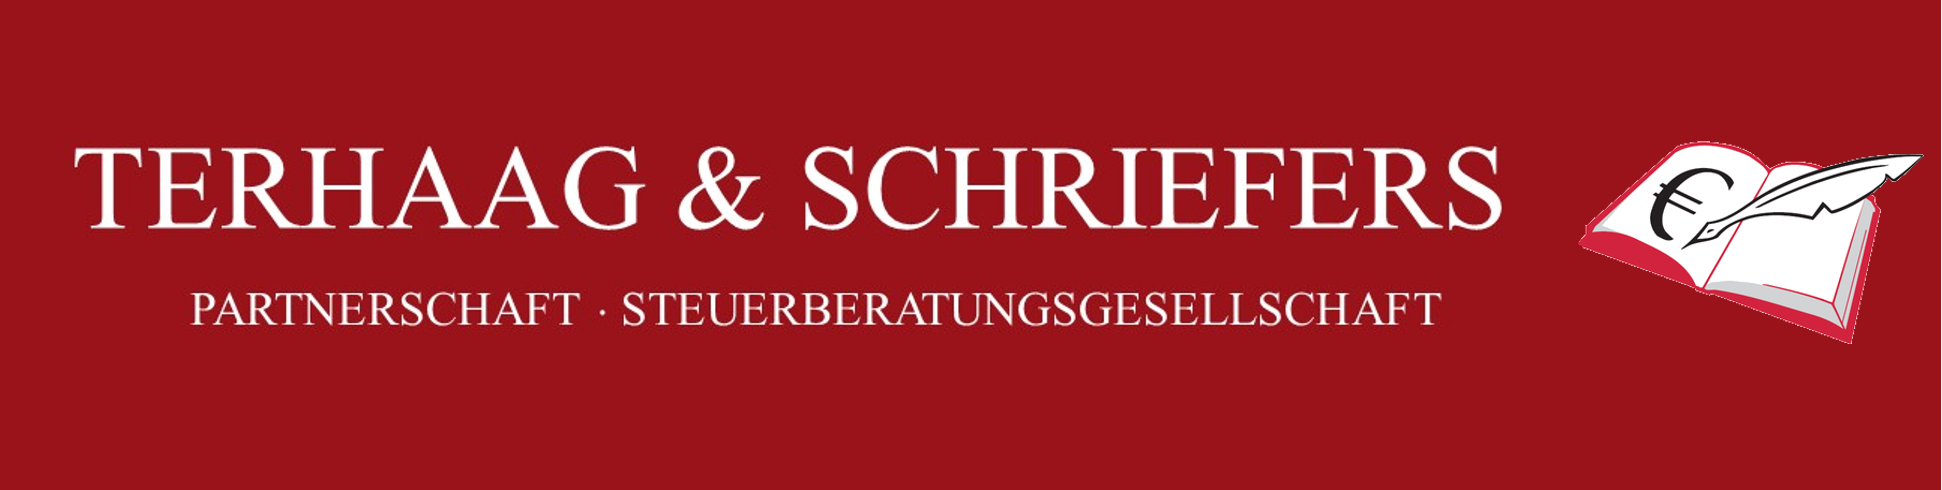 Terhaag & Schriefers